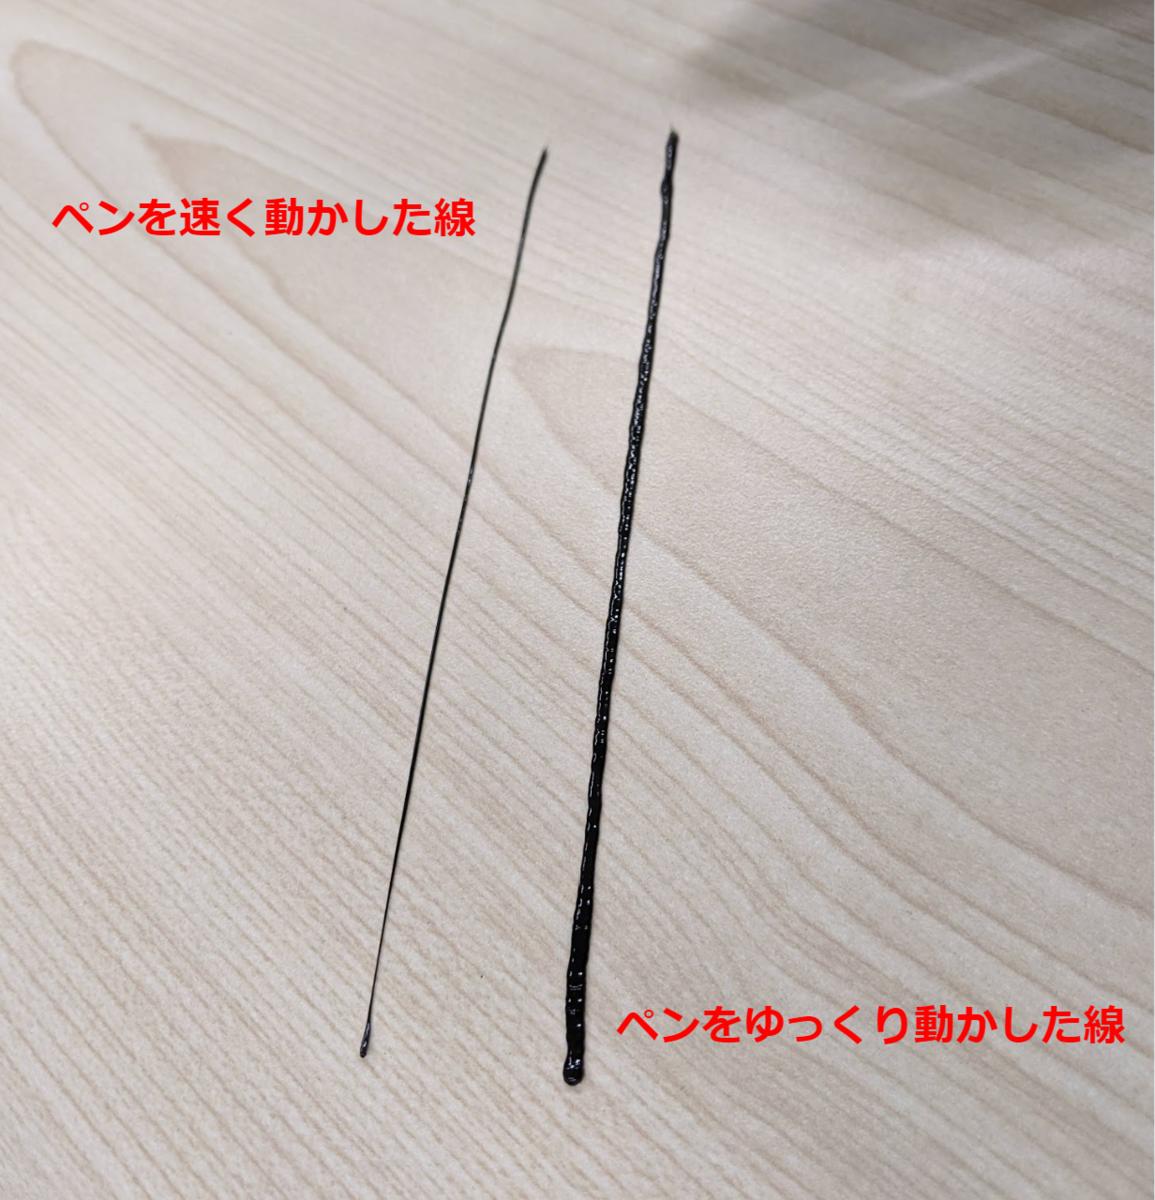 f:id:watagashitarou:20191207234031p:plain